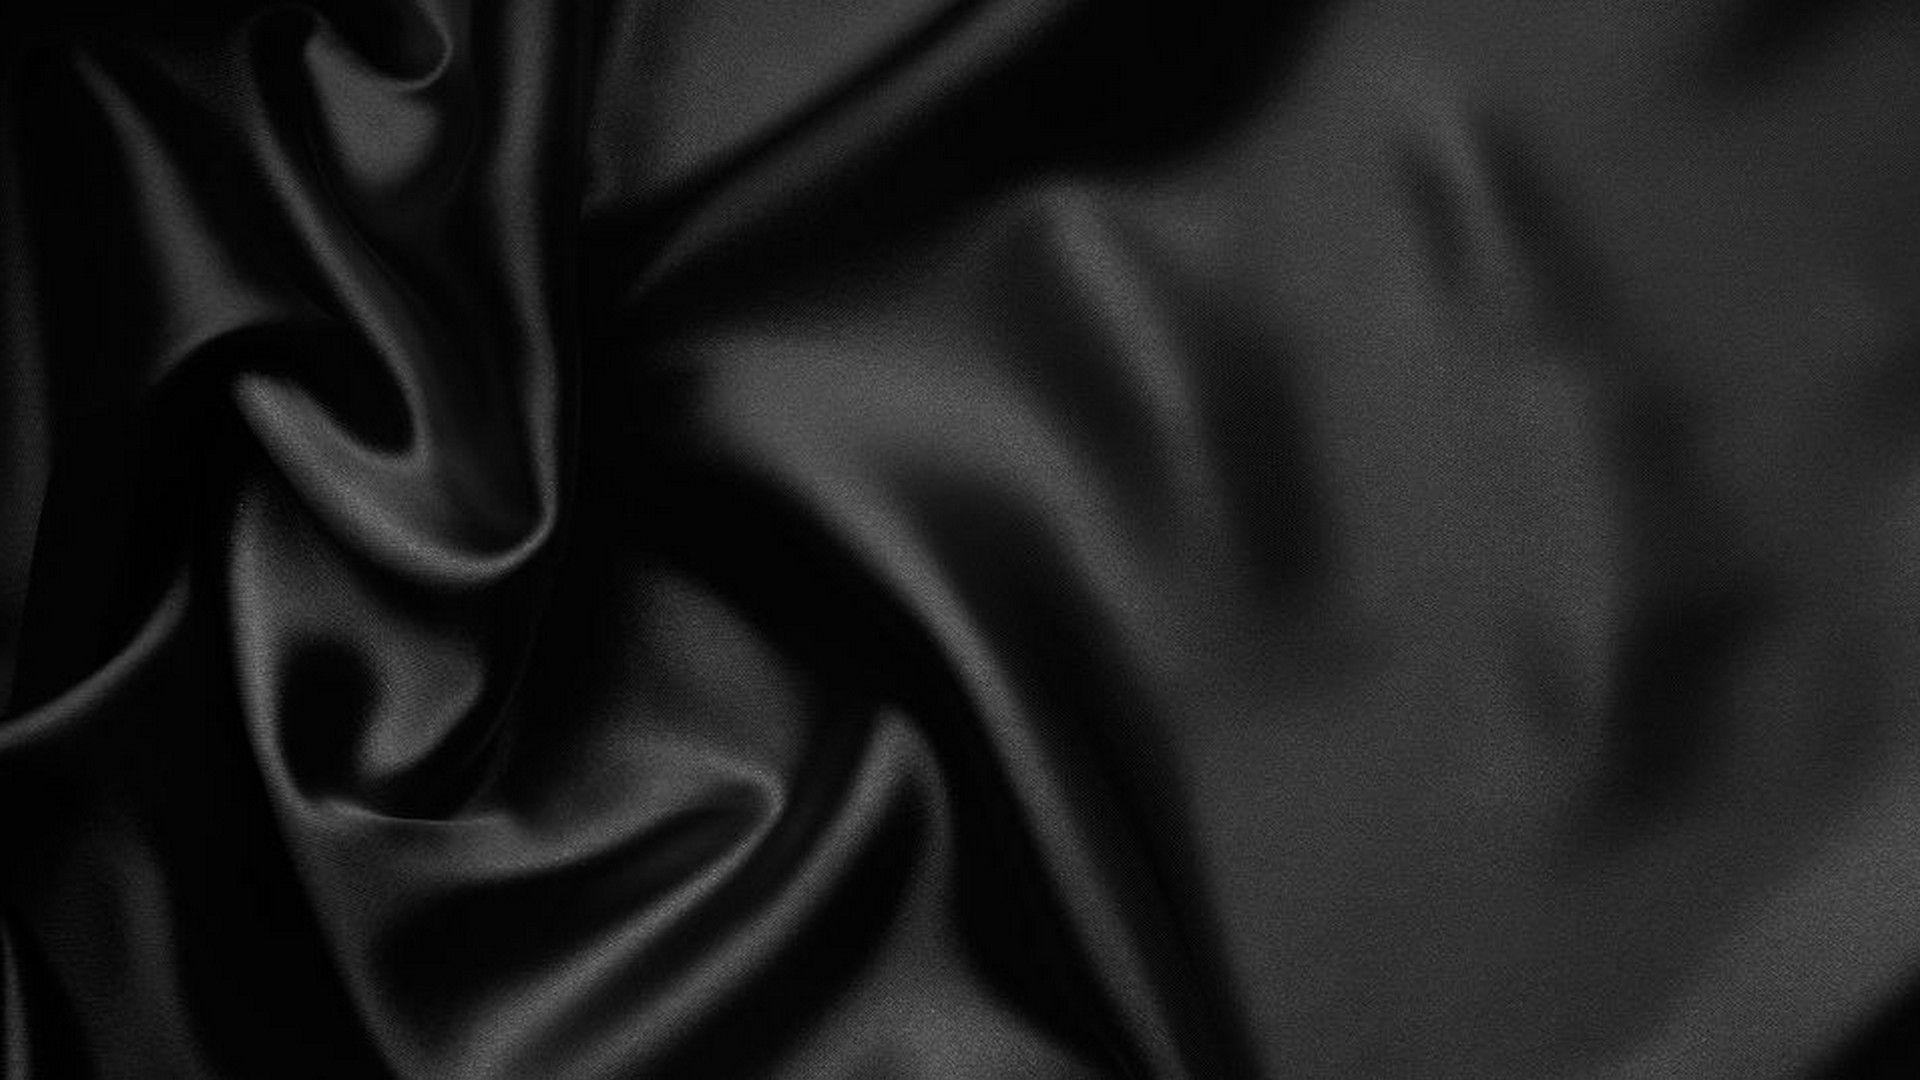 Black Silk Hd Wallpaper 2021 Live Wallpaper Hd Wallpaper Live Wallpapers Best Wallpaper Hd